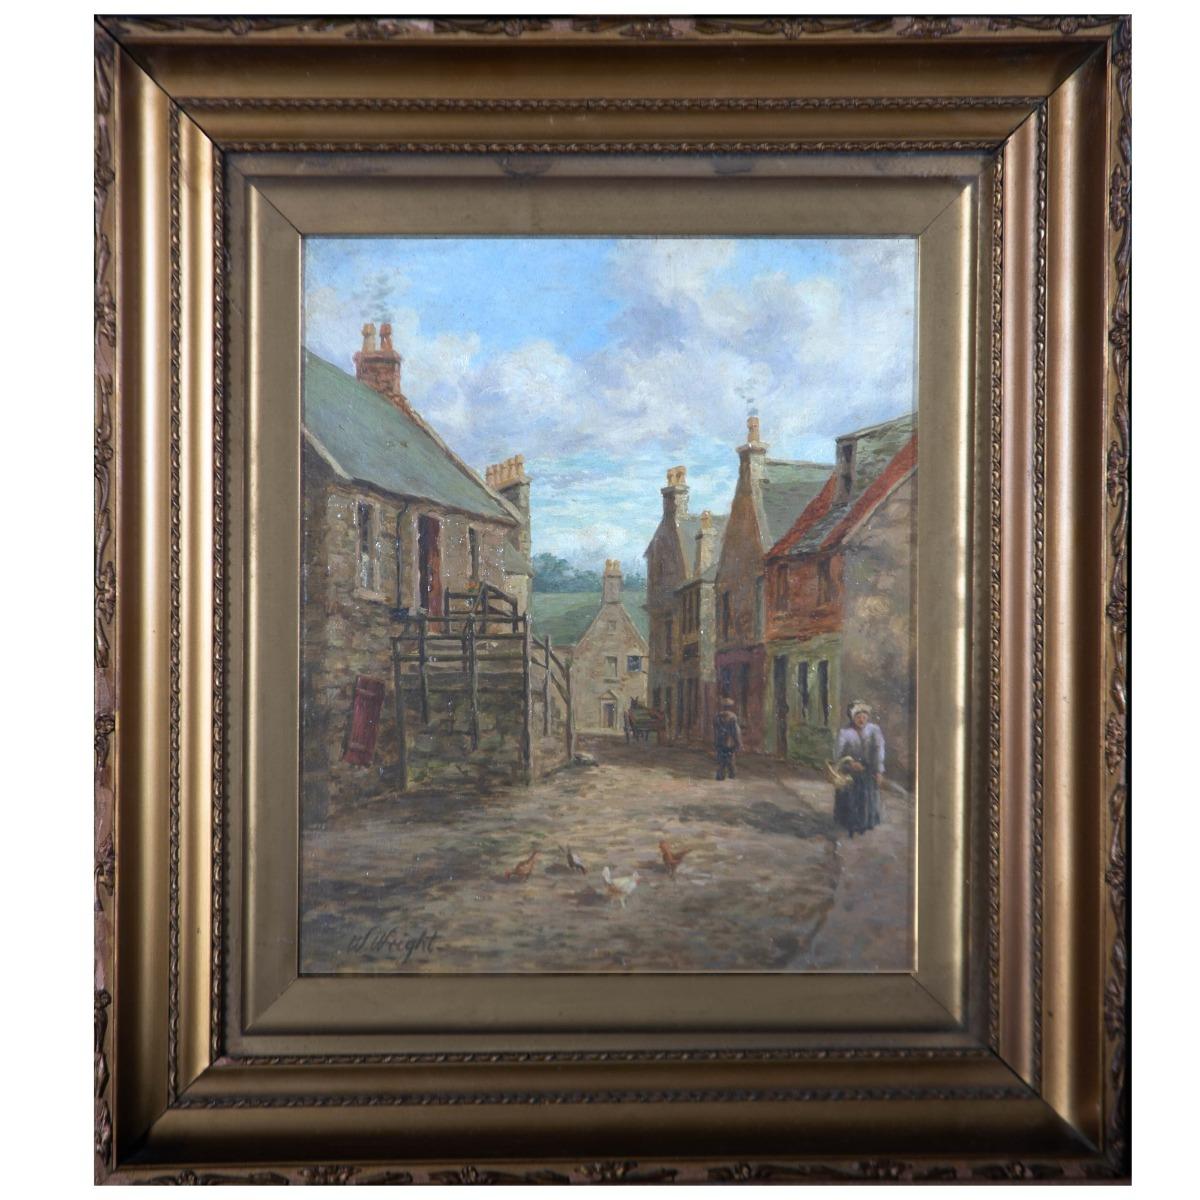 W. Wright - 1913 Oil, A Village Street